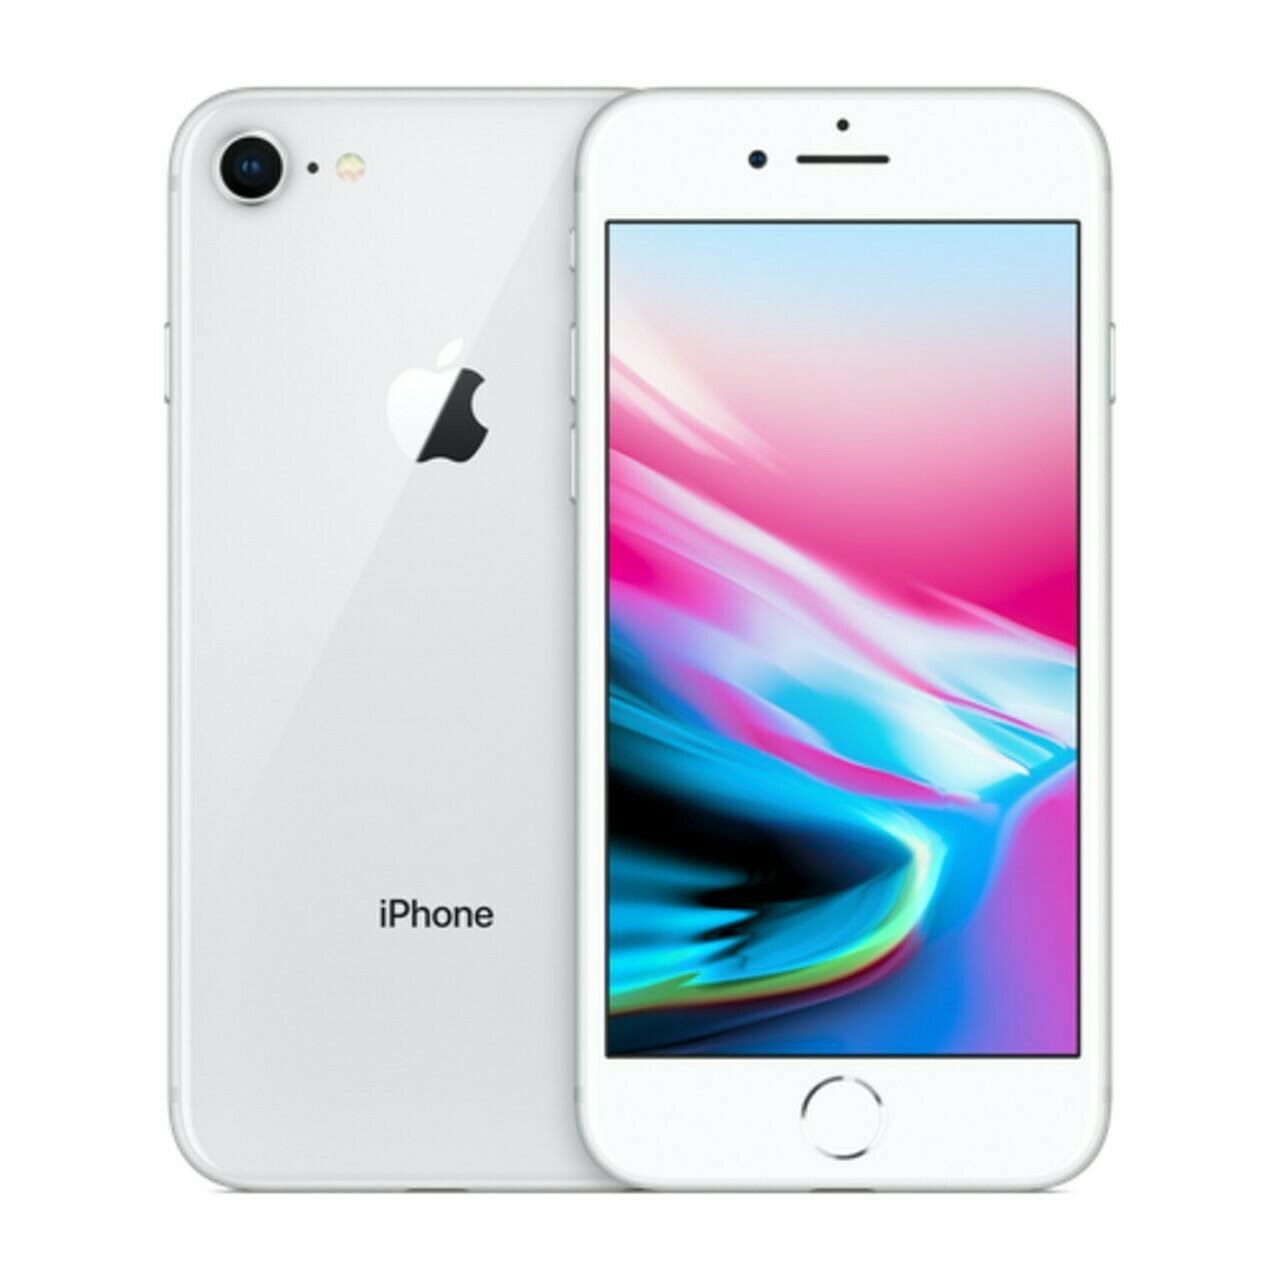 Apple iPhone 8 a1863 64GB  Unlocked-Very Good